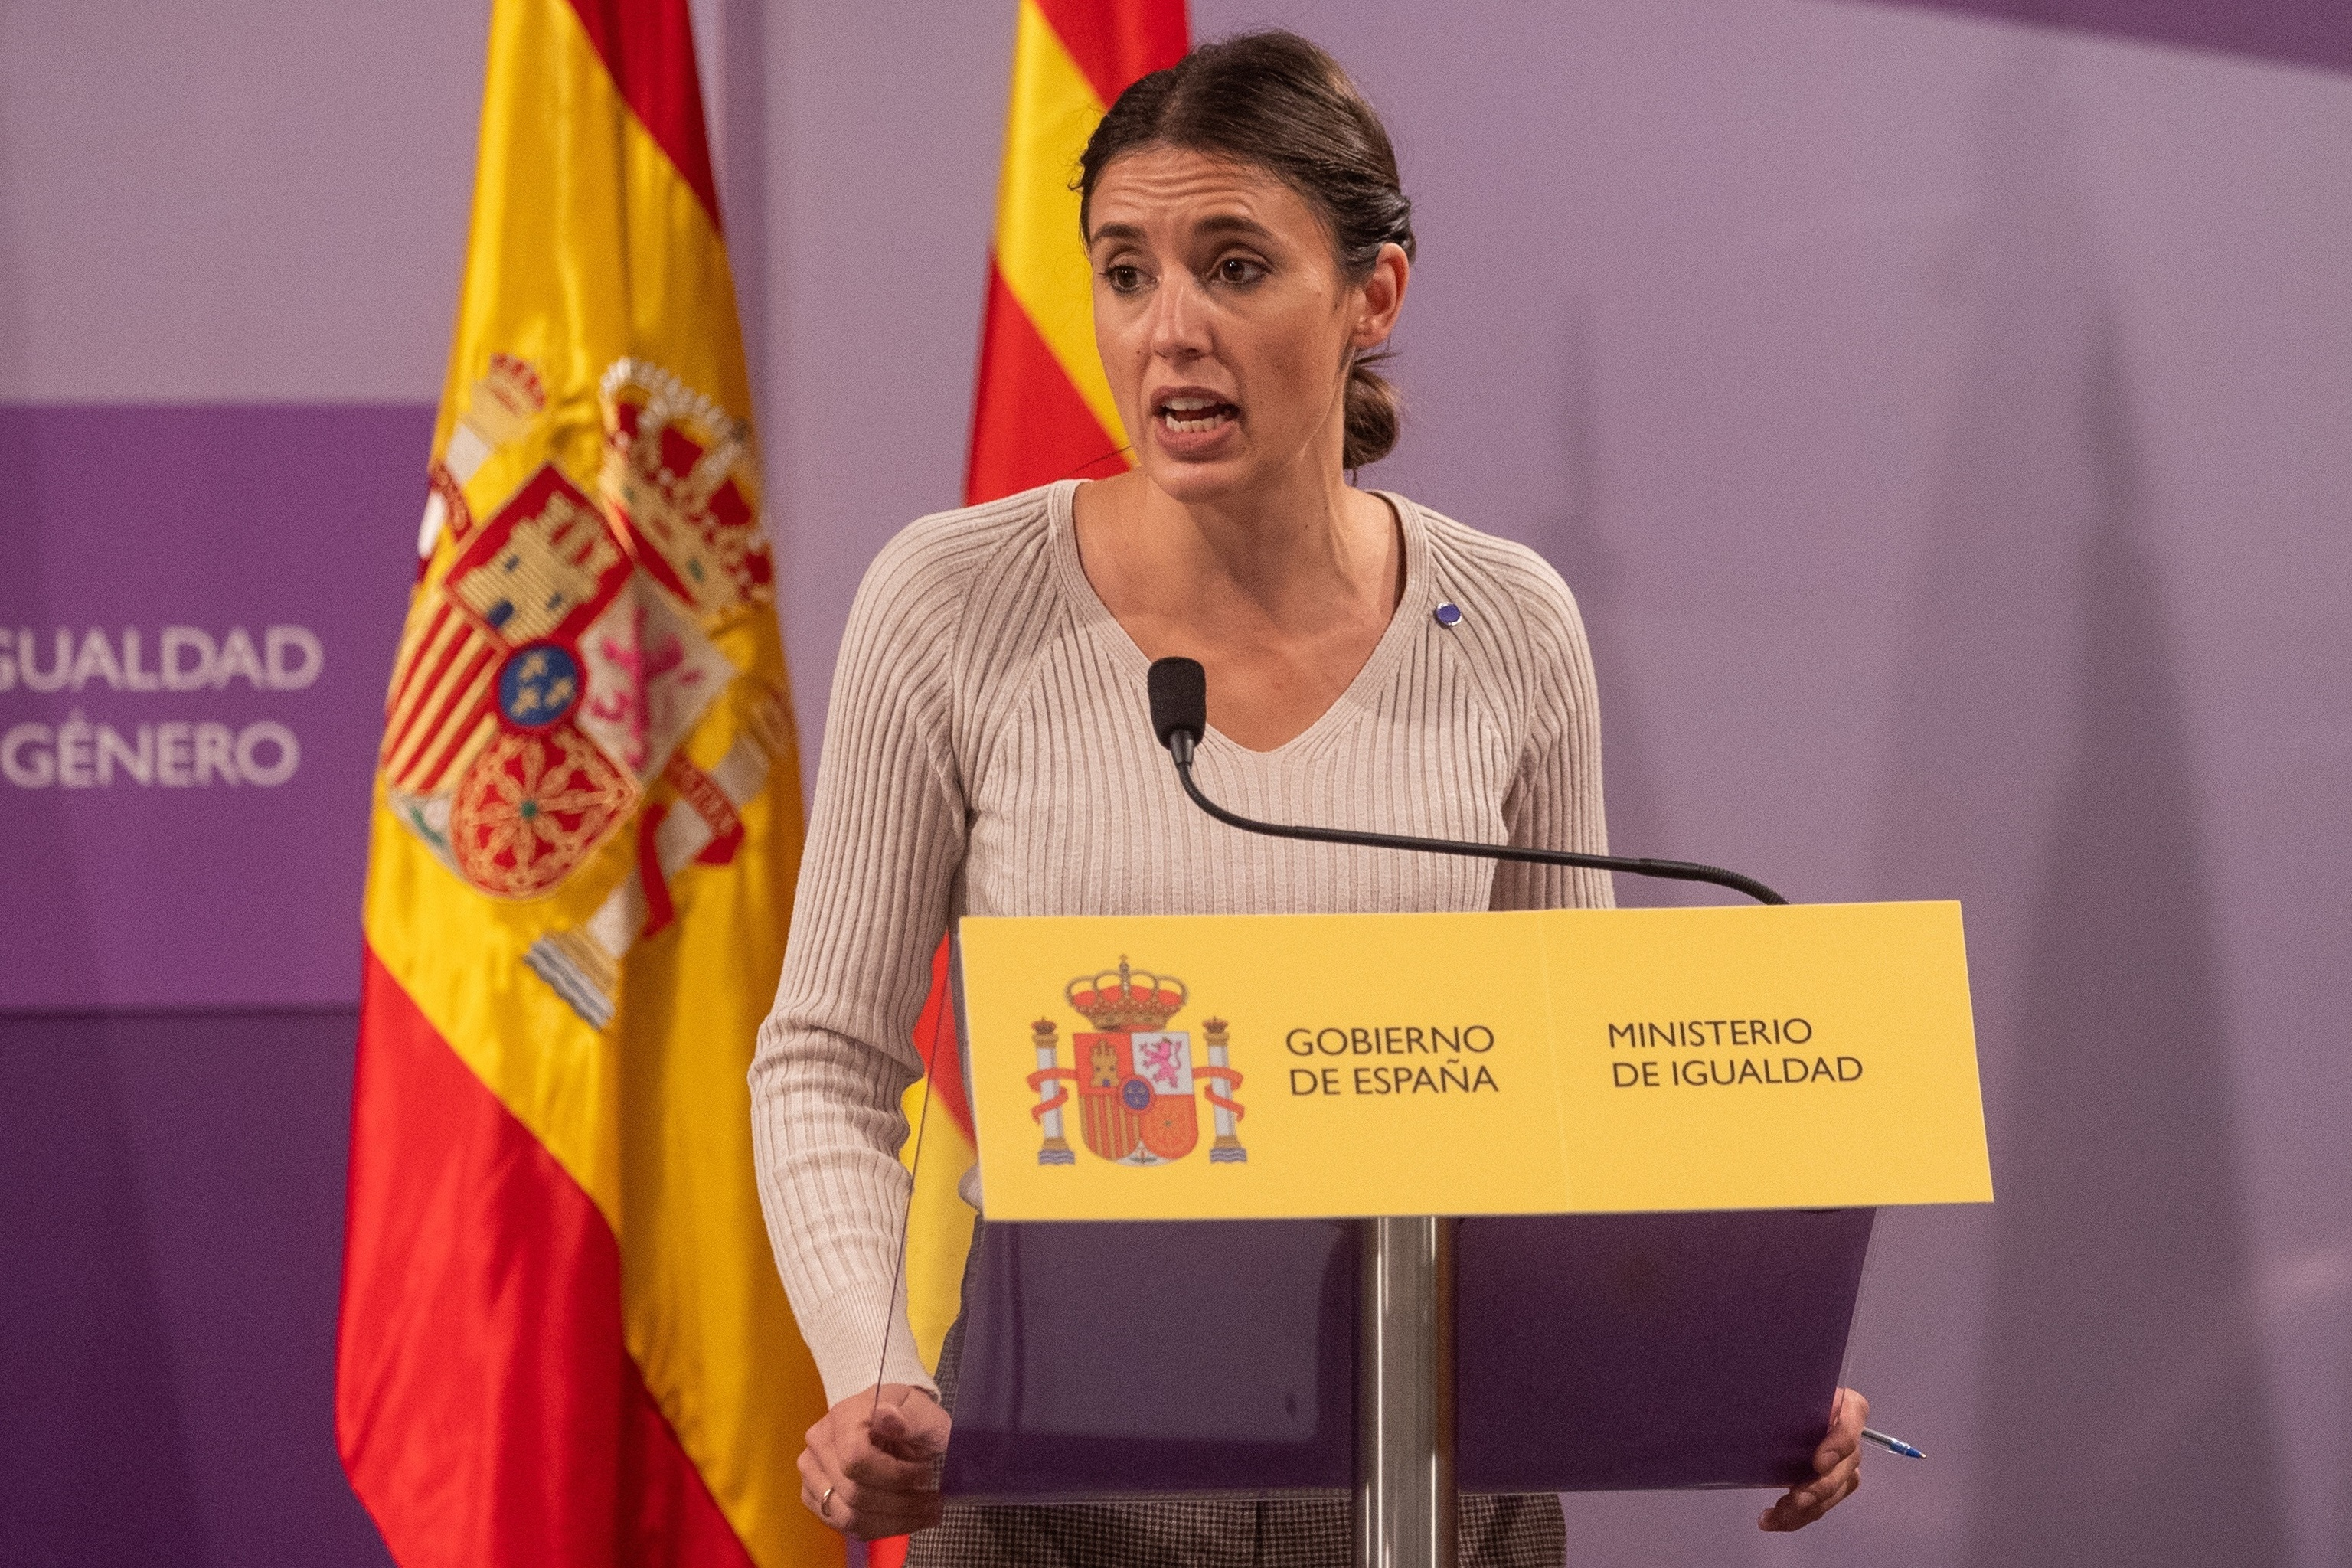 La ministra de Igualdad, Irene Montero, este miércoles en rueda de prensa.